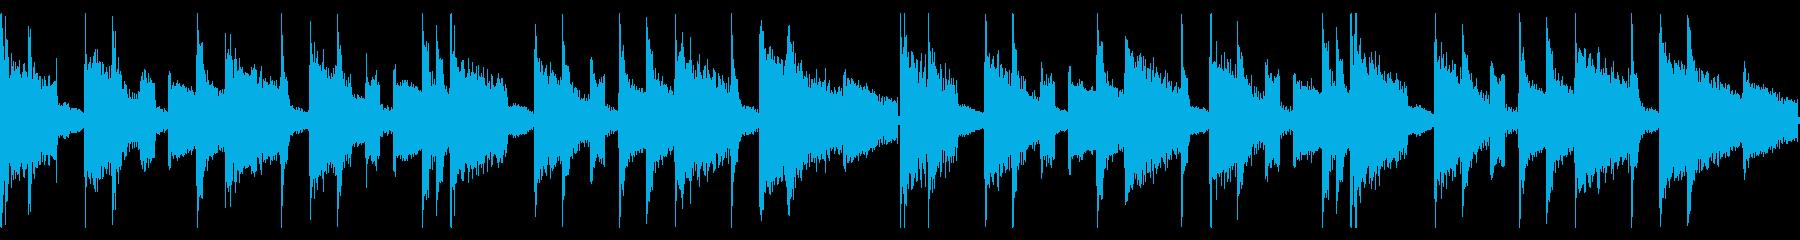 Instrumental loop with an impressive piano loop's reproduced waveform